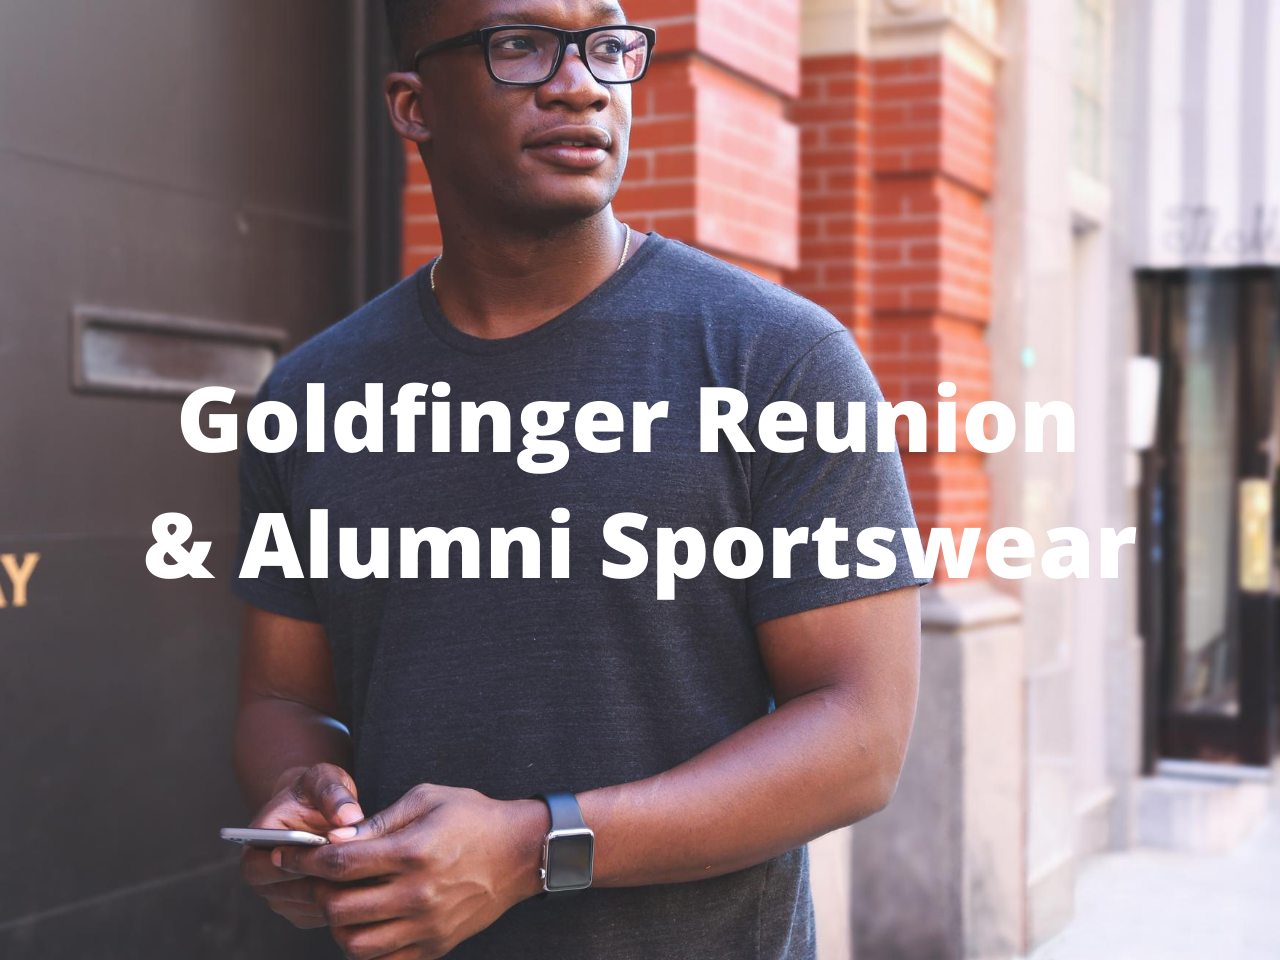 Goldfinger Reunion & Alumni Sportswear